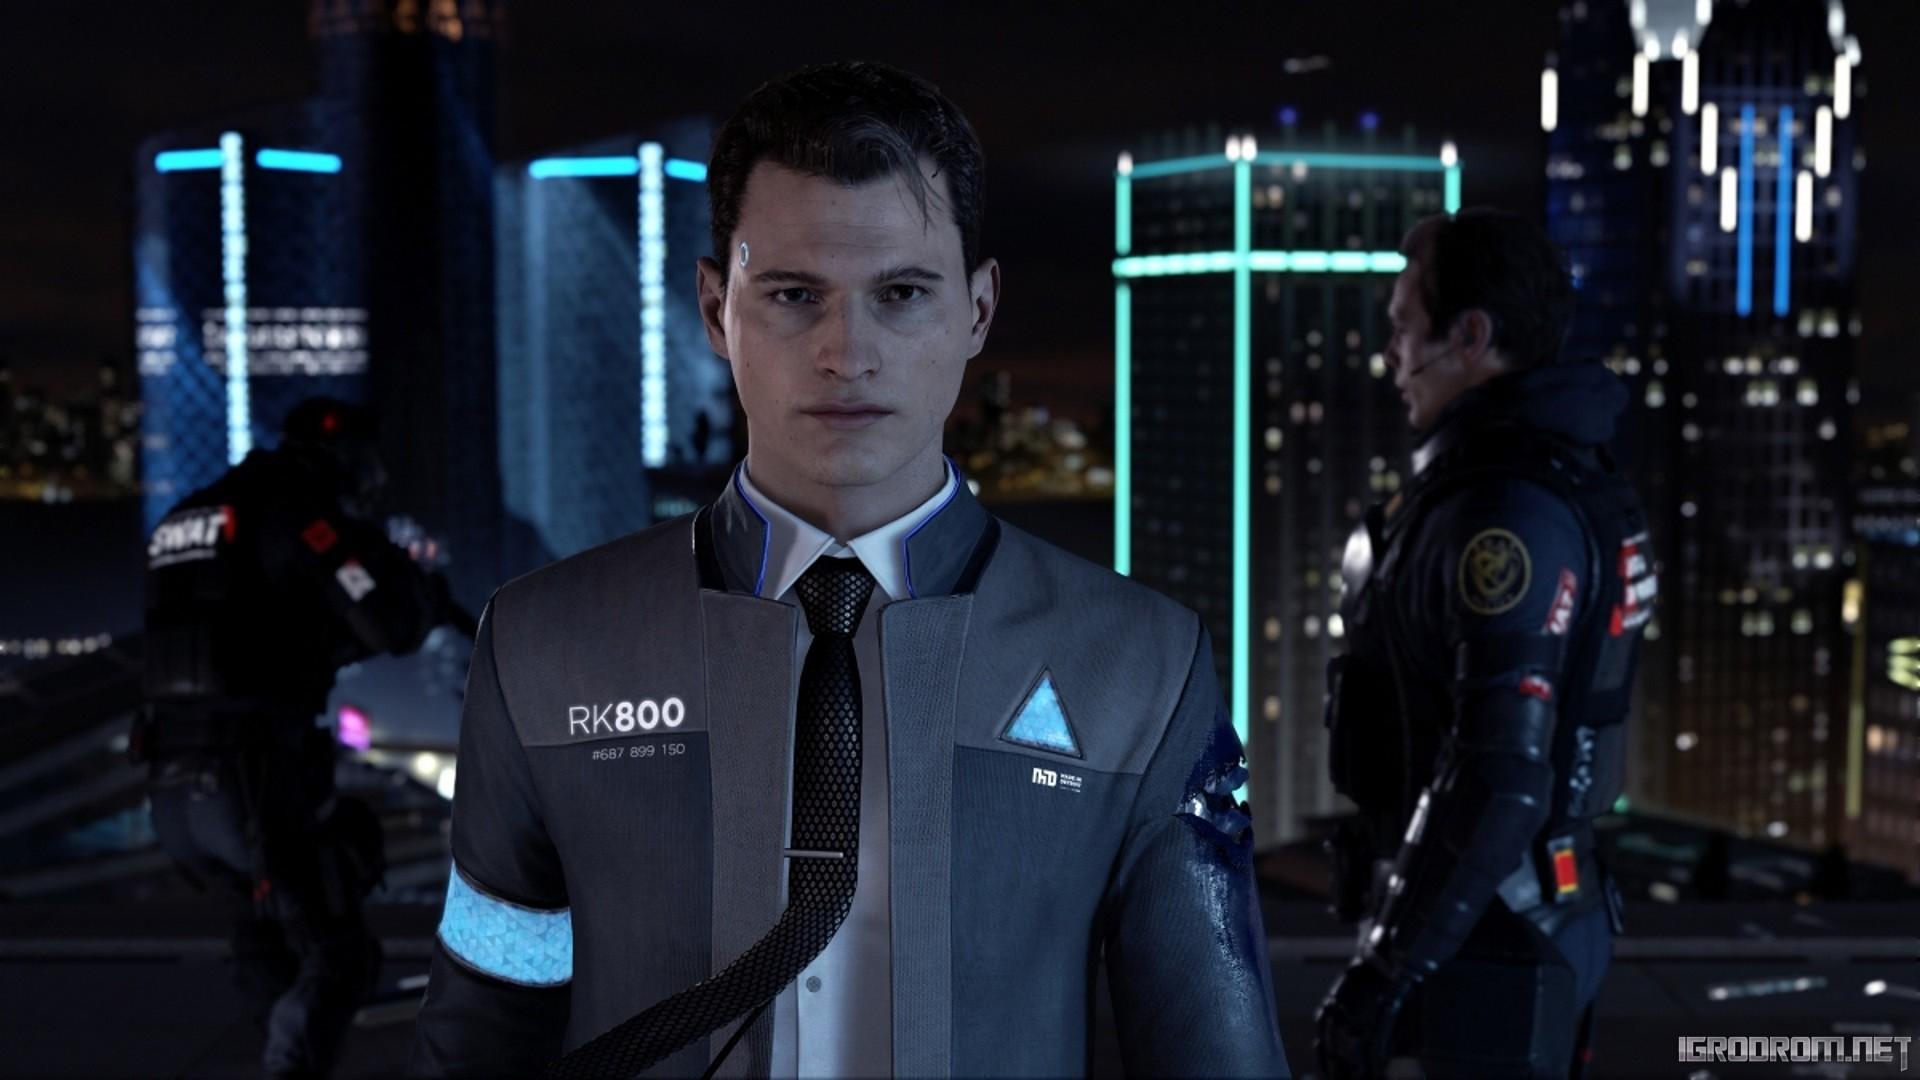 Андроид-детектив Коннор 521